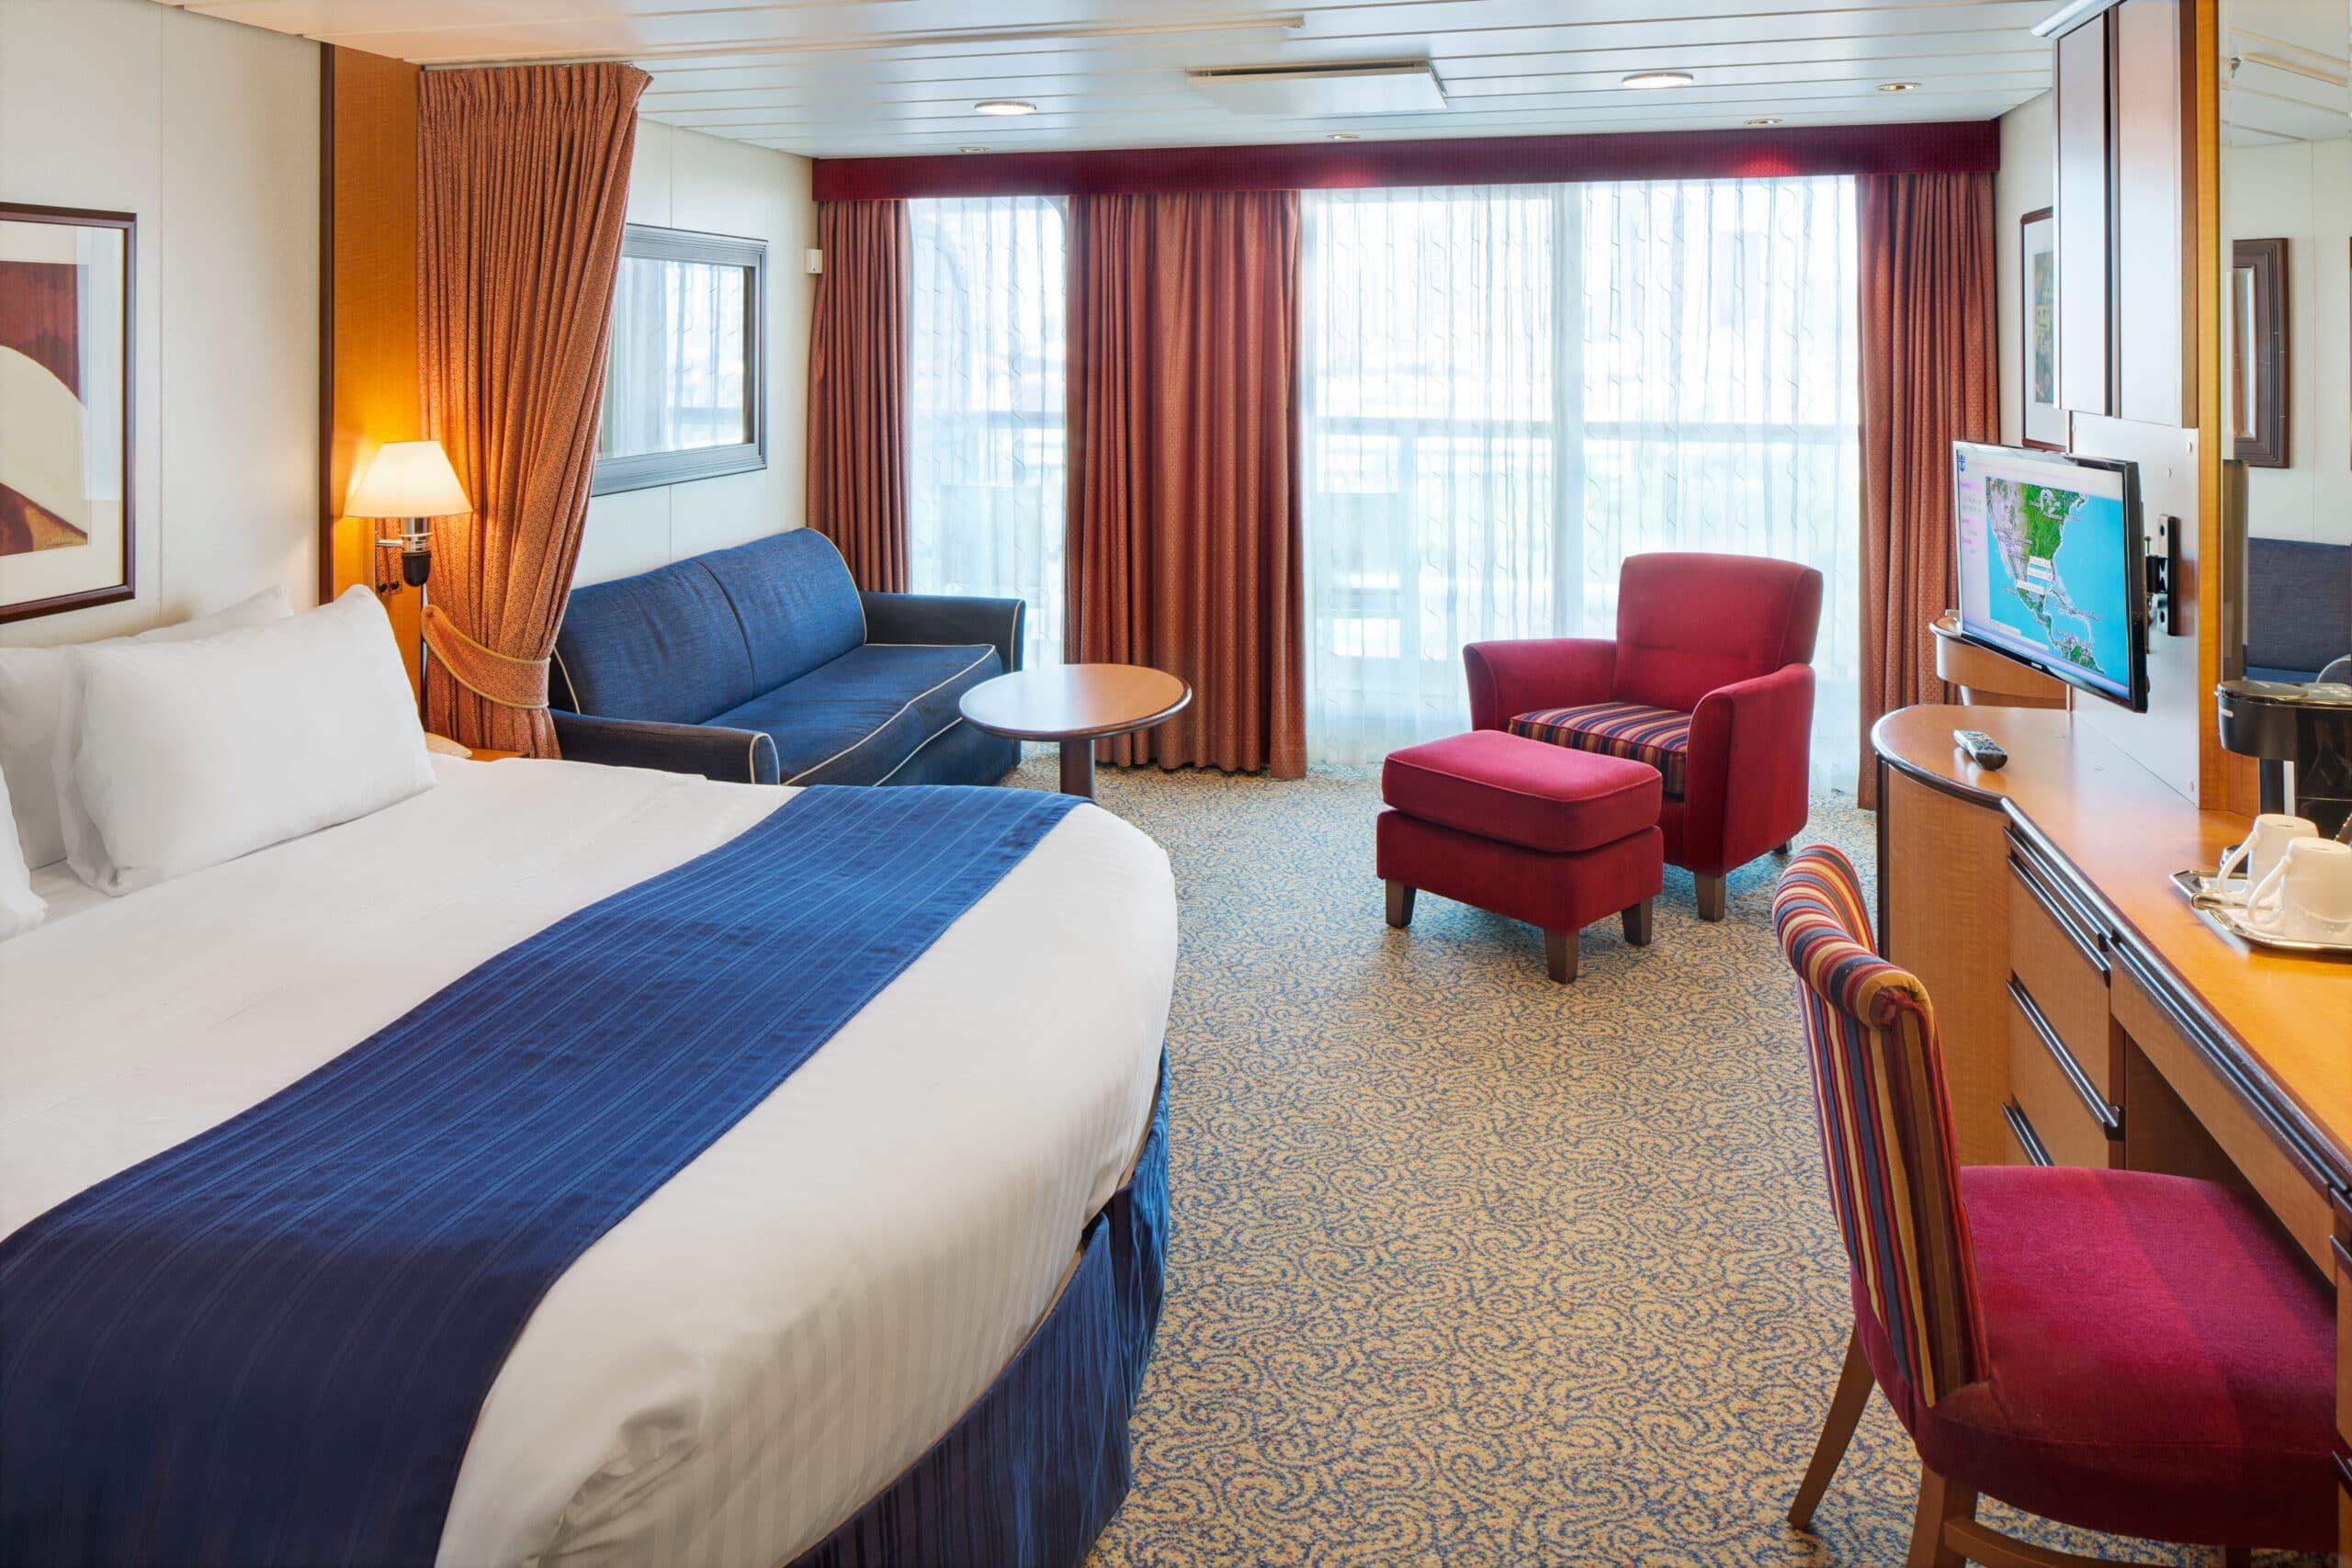 Royal-Caribbean-International-Brilliance-of-the-Seas-schip-cruiseschip-categorie-J3-junior-suite